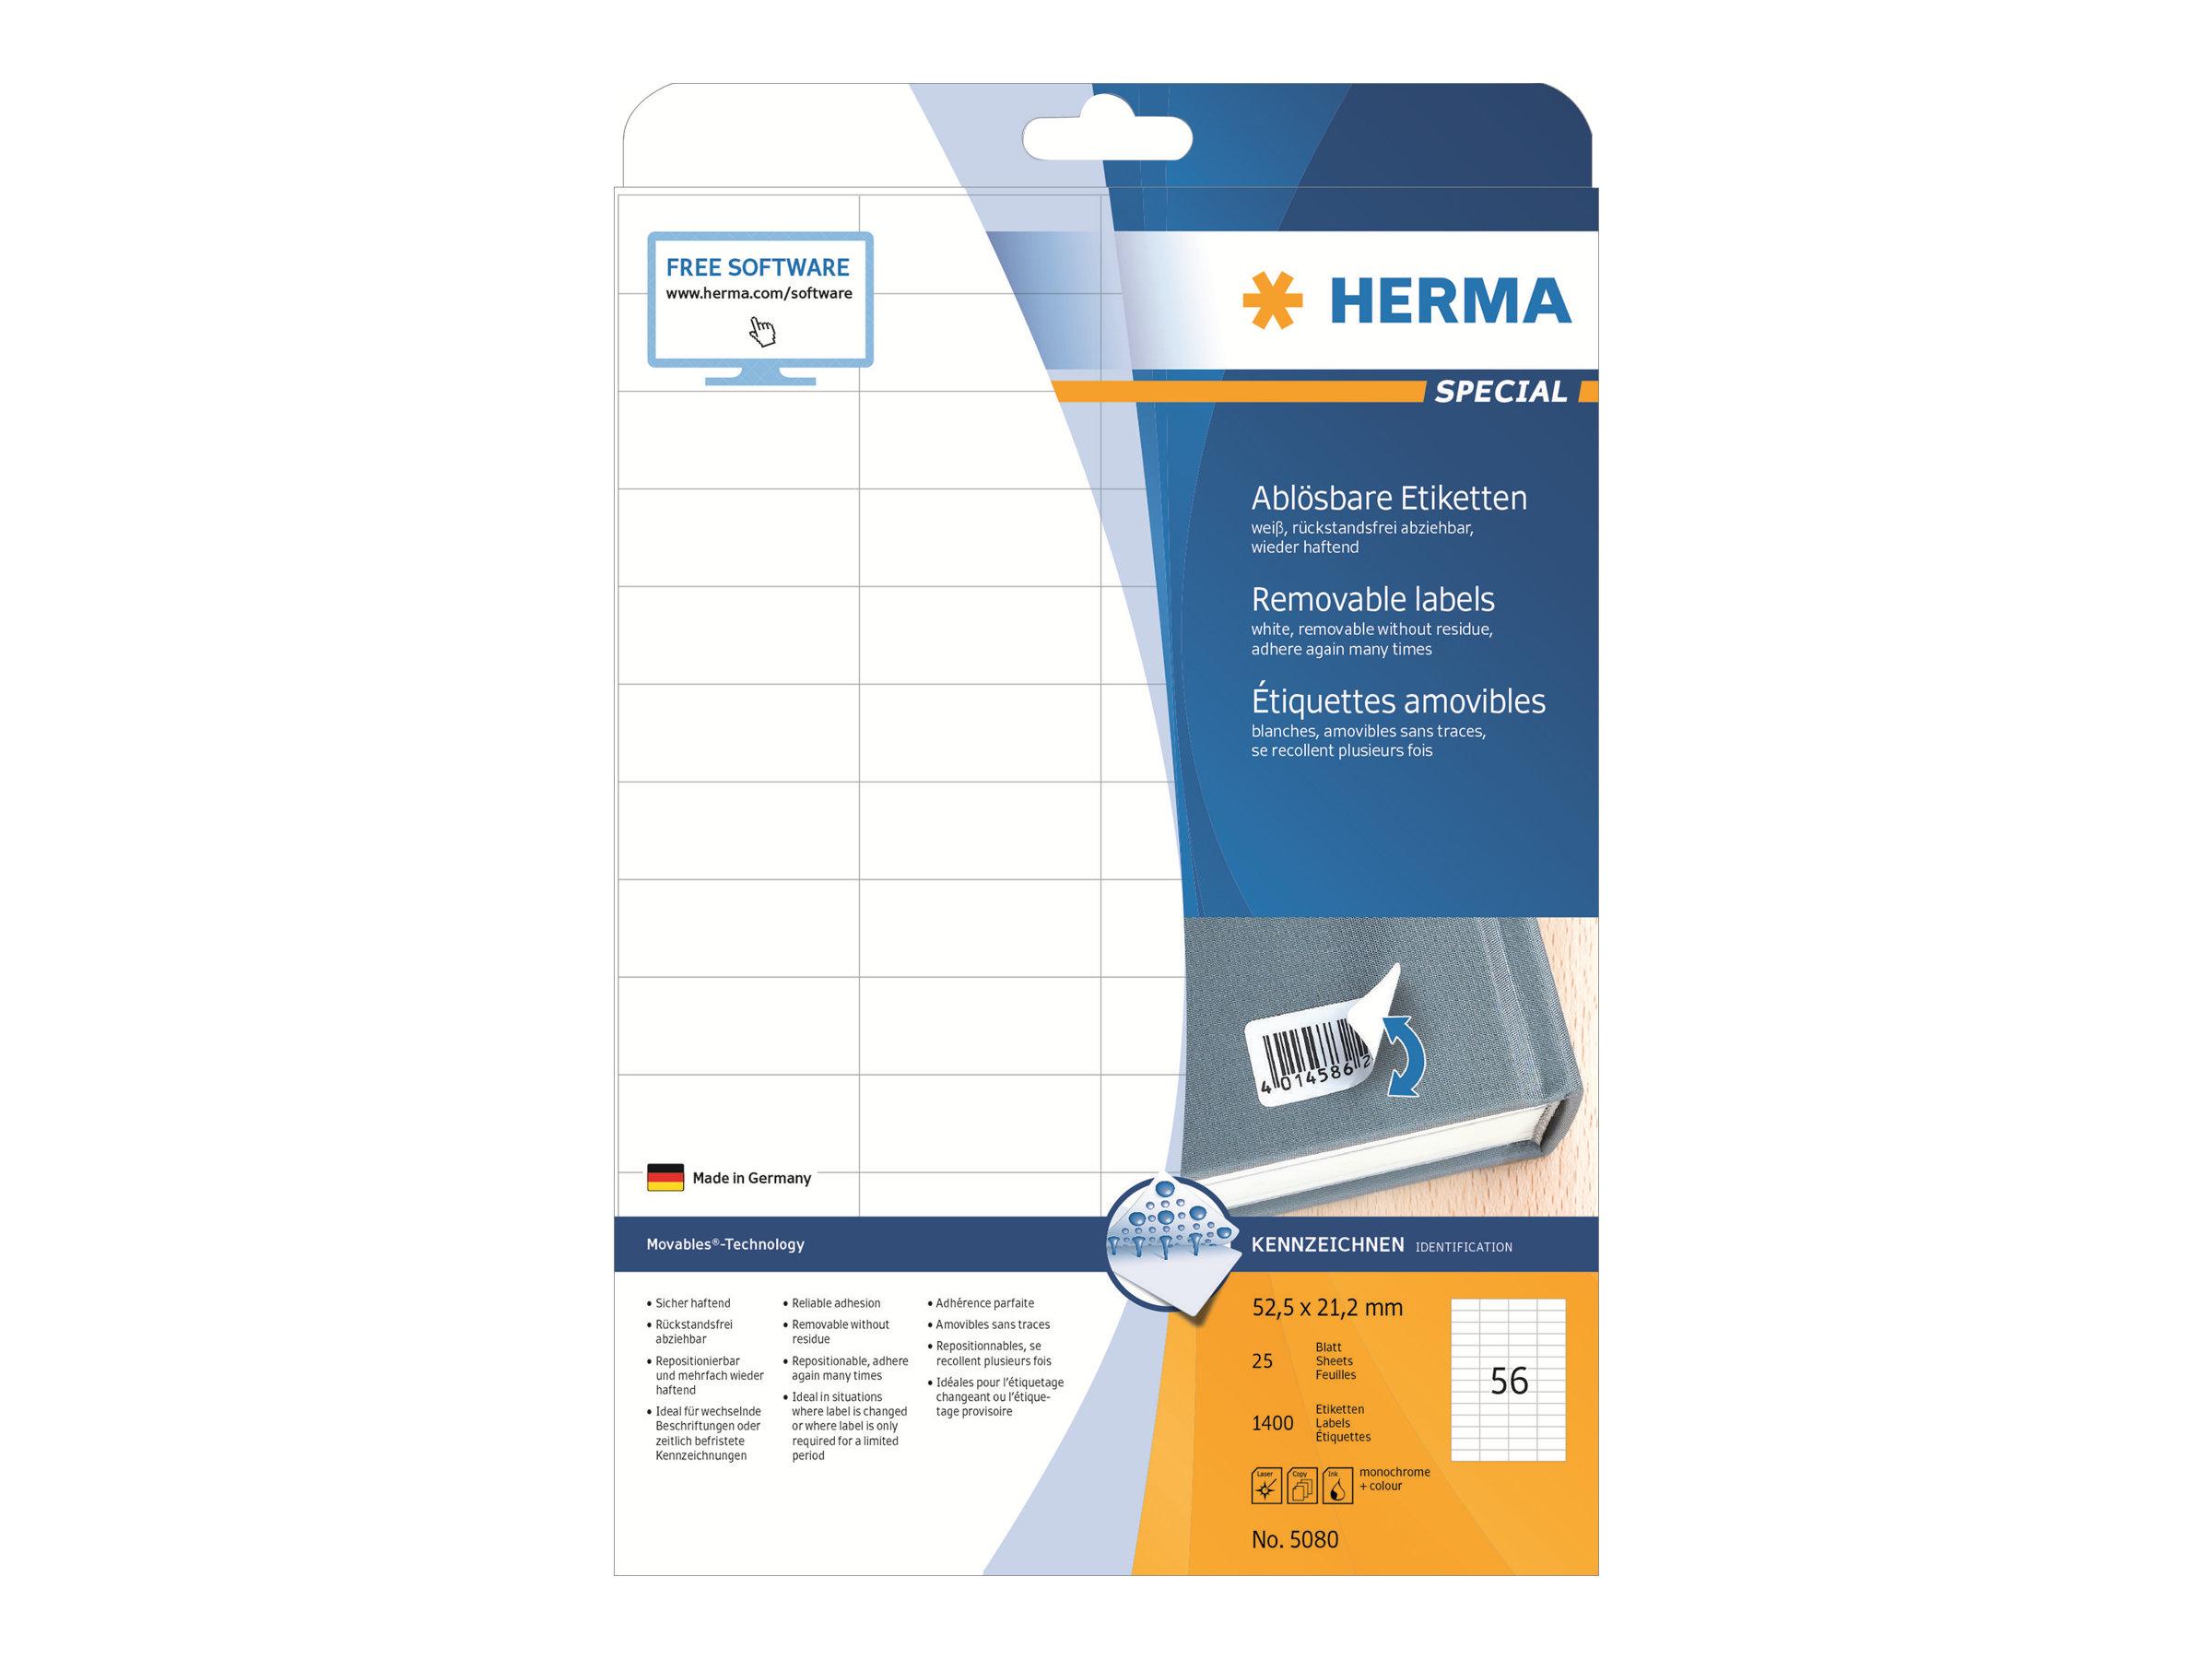 HERMA Special - Papier - matt - selbstklebend, entfernbarer Klebstoff - weiß - 52.5 x 21.2 mm 1400 Etikett(en) (25 Bogen x 56)